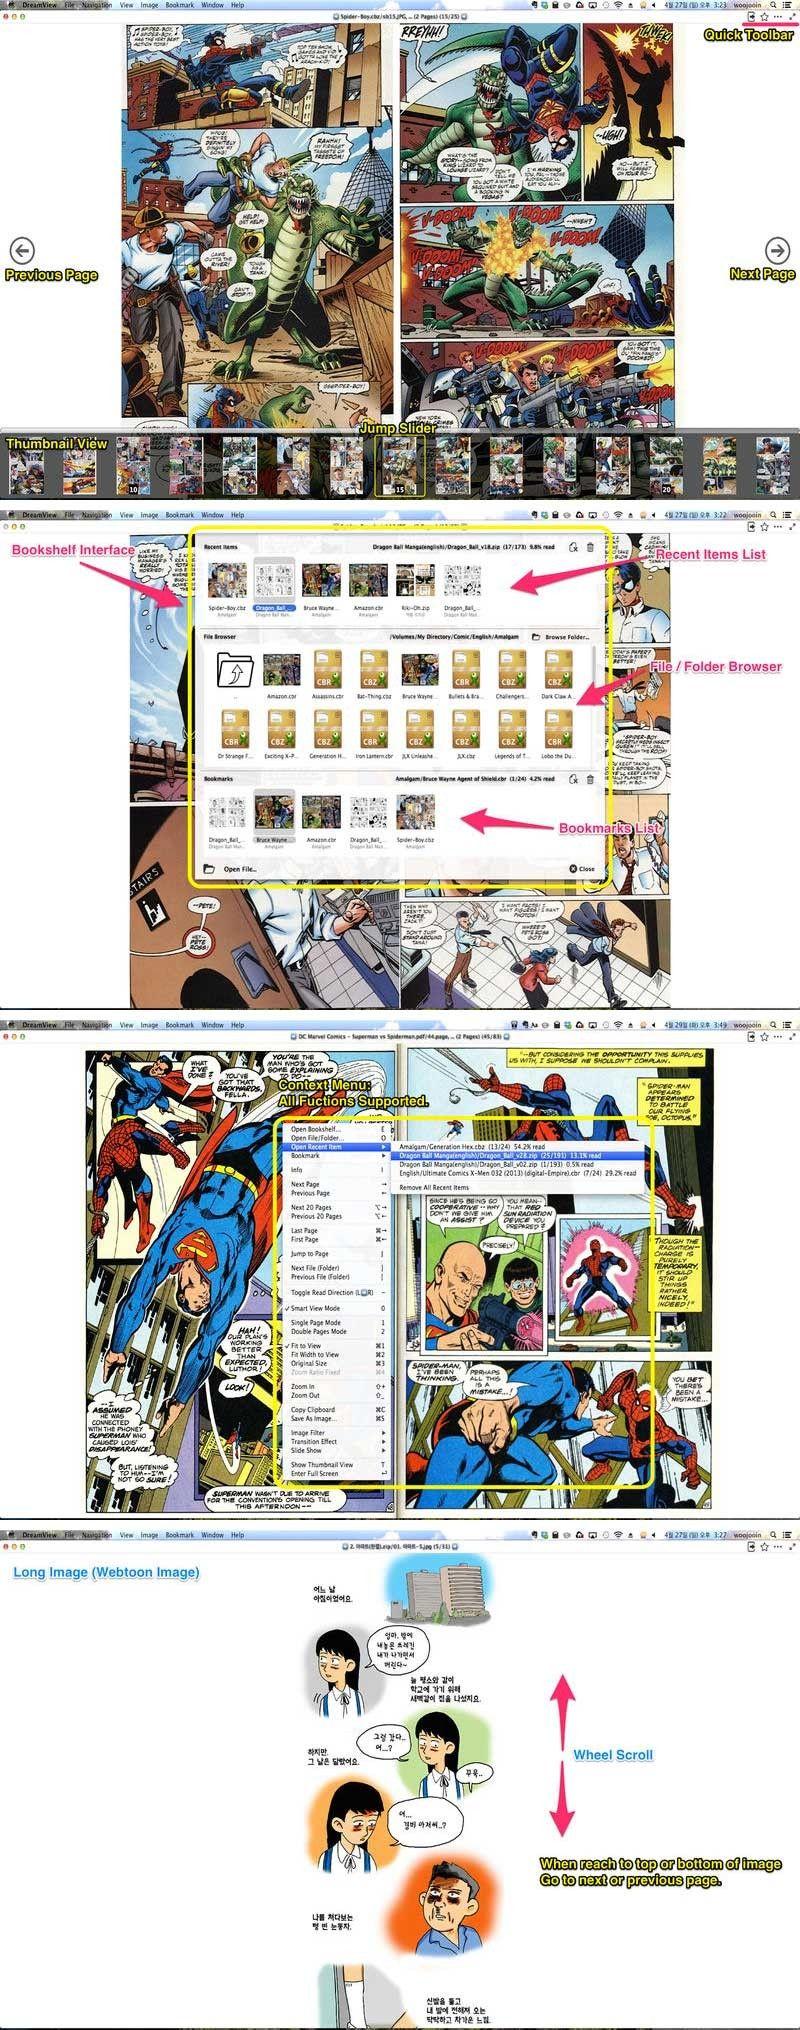 DreamView 1.7 for Mac 破解版 漫画和卡通阅读器 Application